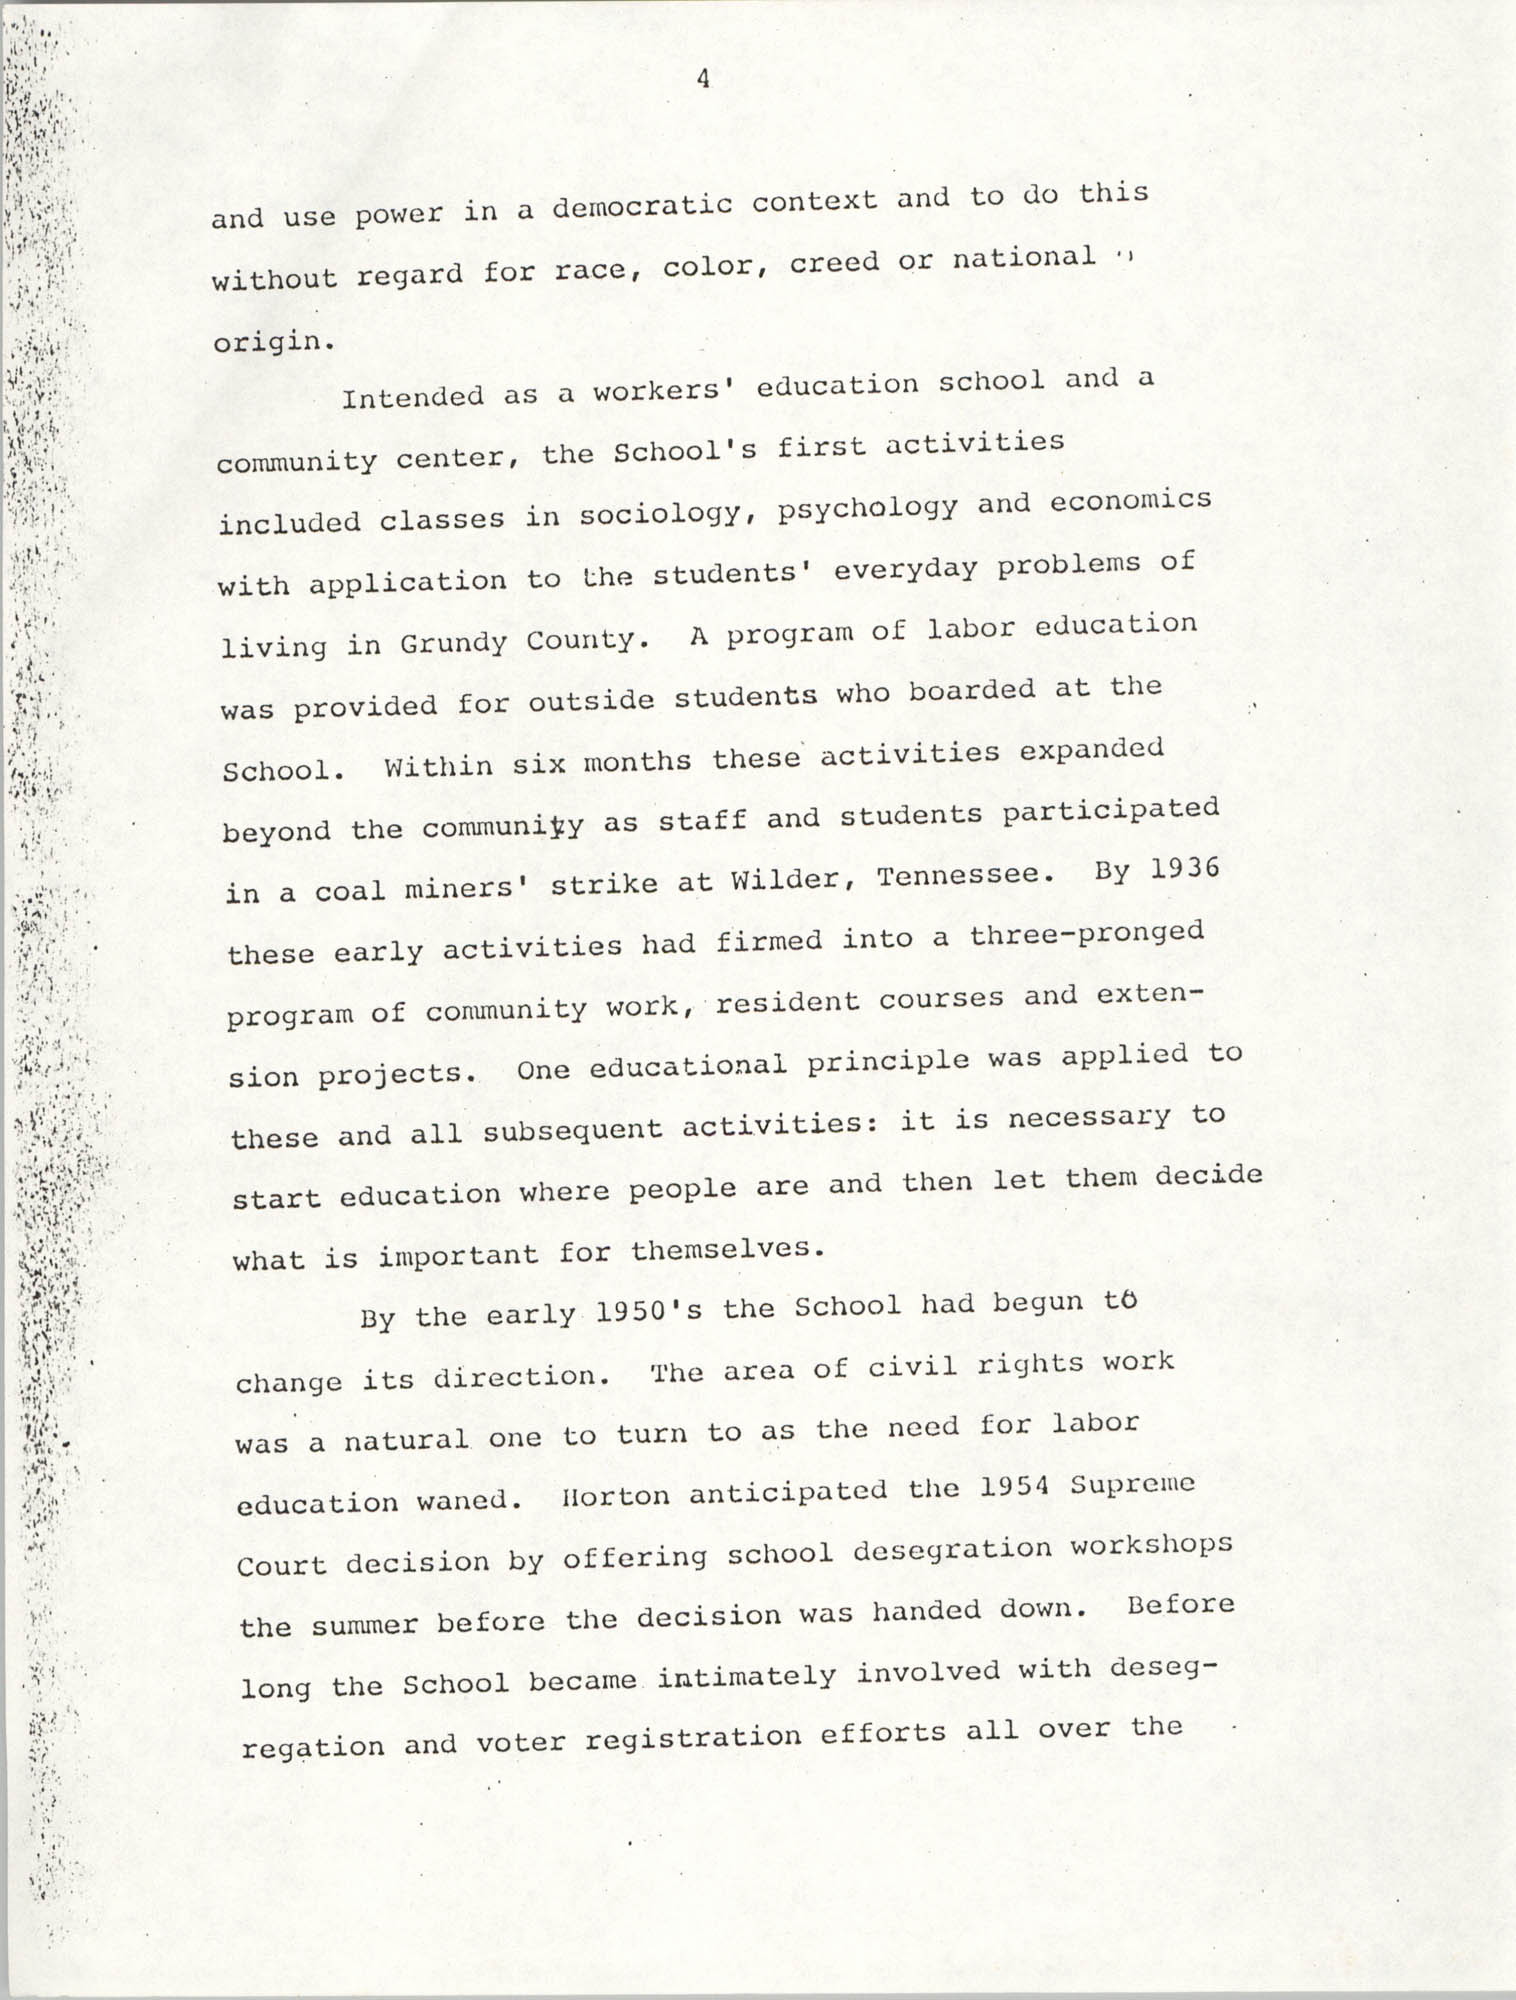 Dissertation Proposal, Page 4